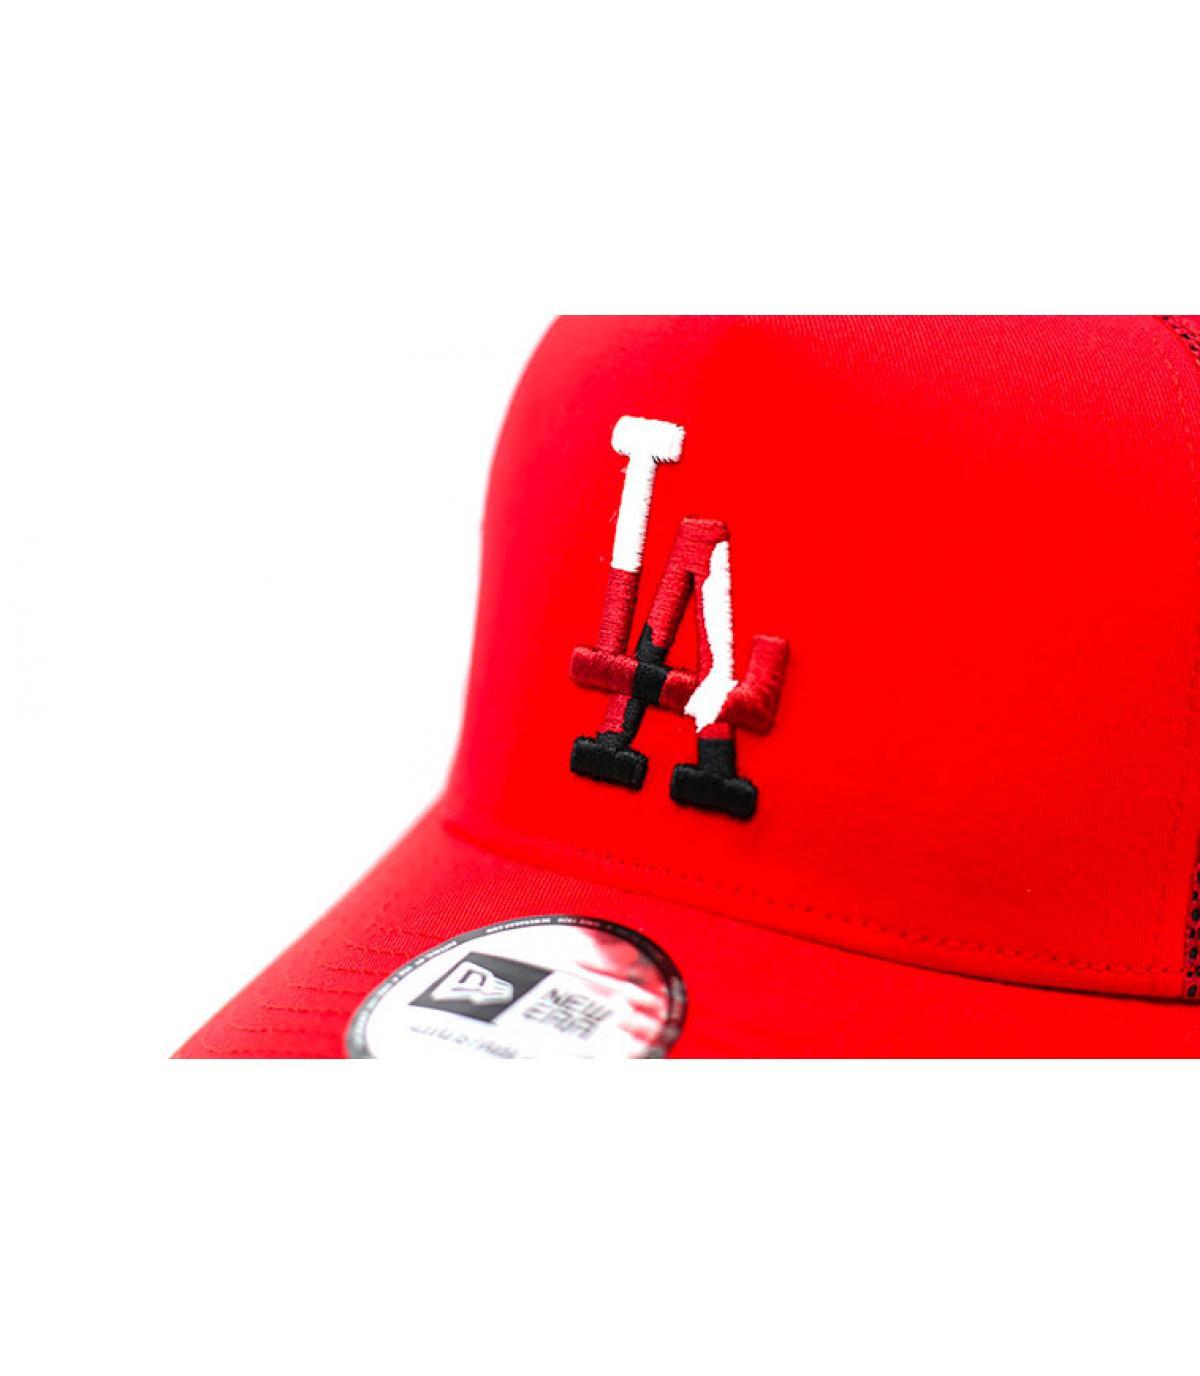 Détails Trucker Camo Infill LA red - image 3